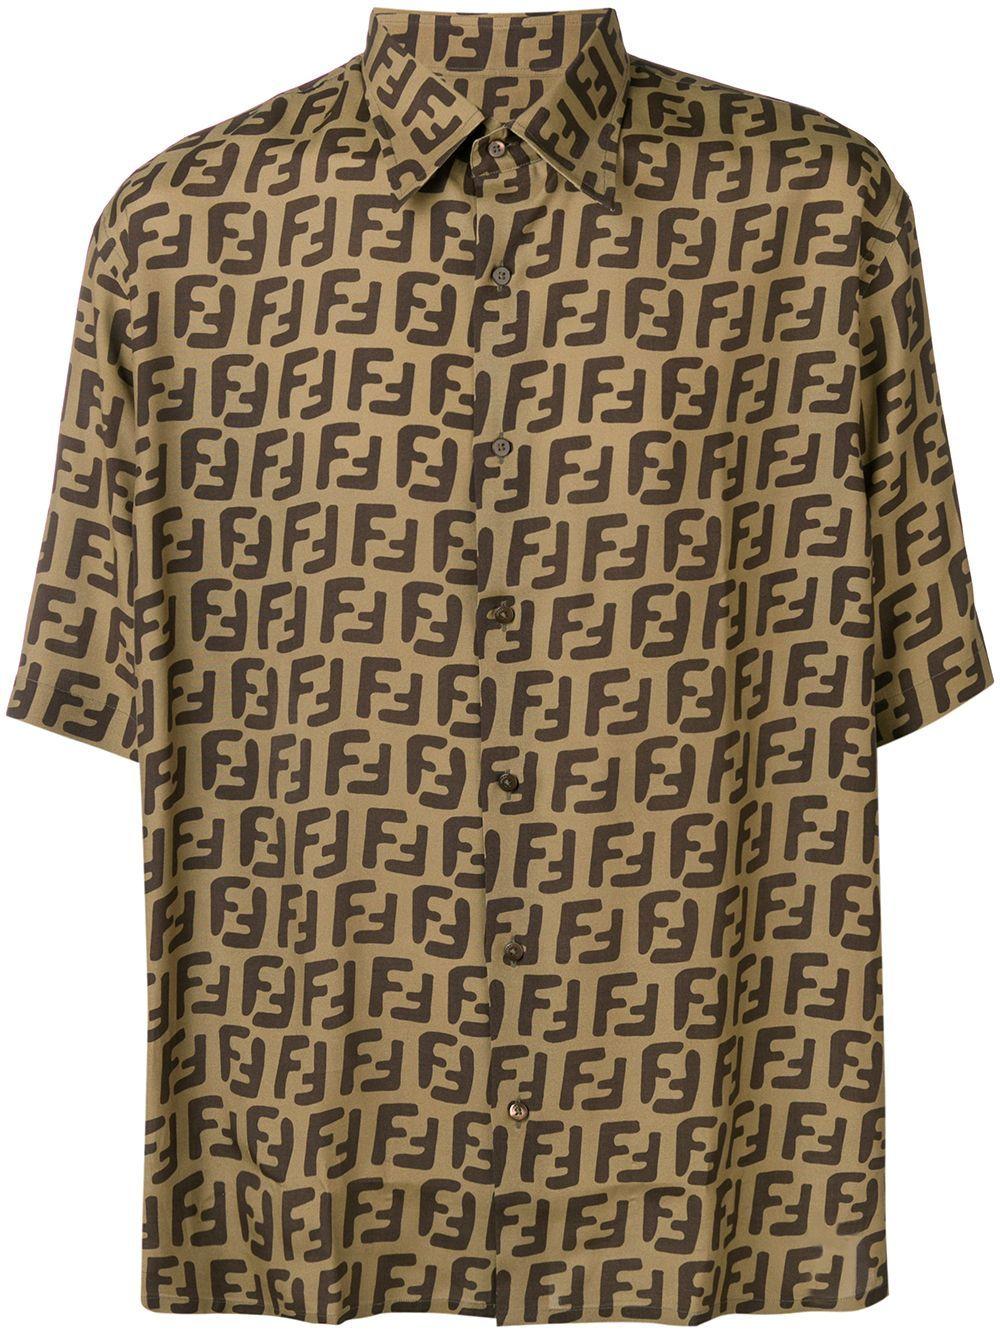 Allover Printed Bowling Shirt In F13iz Fendi, Shirts